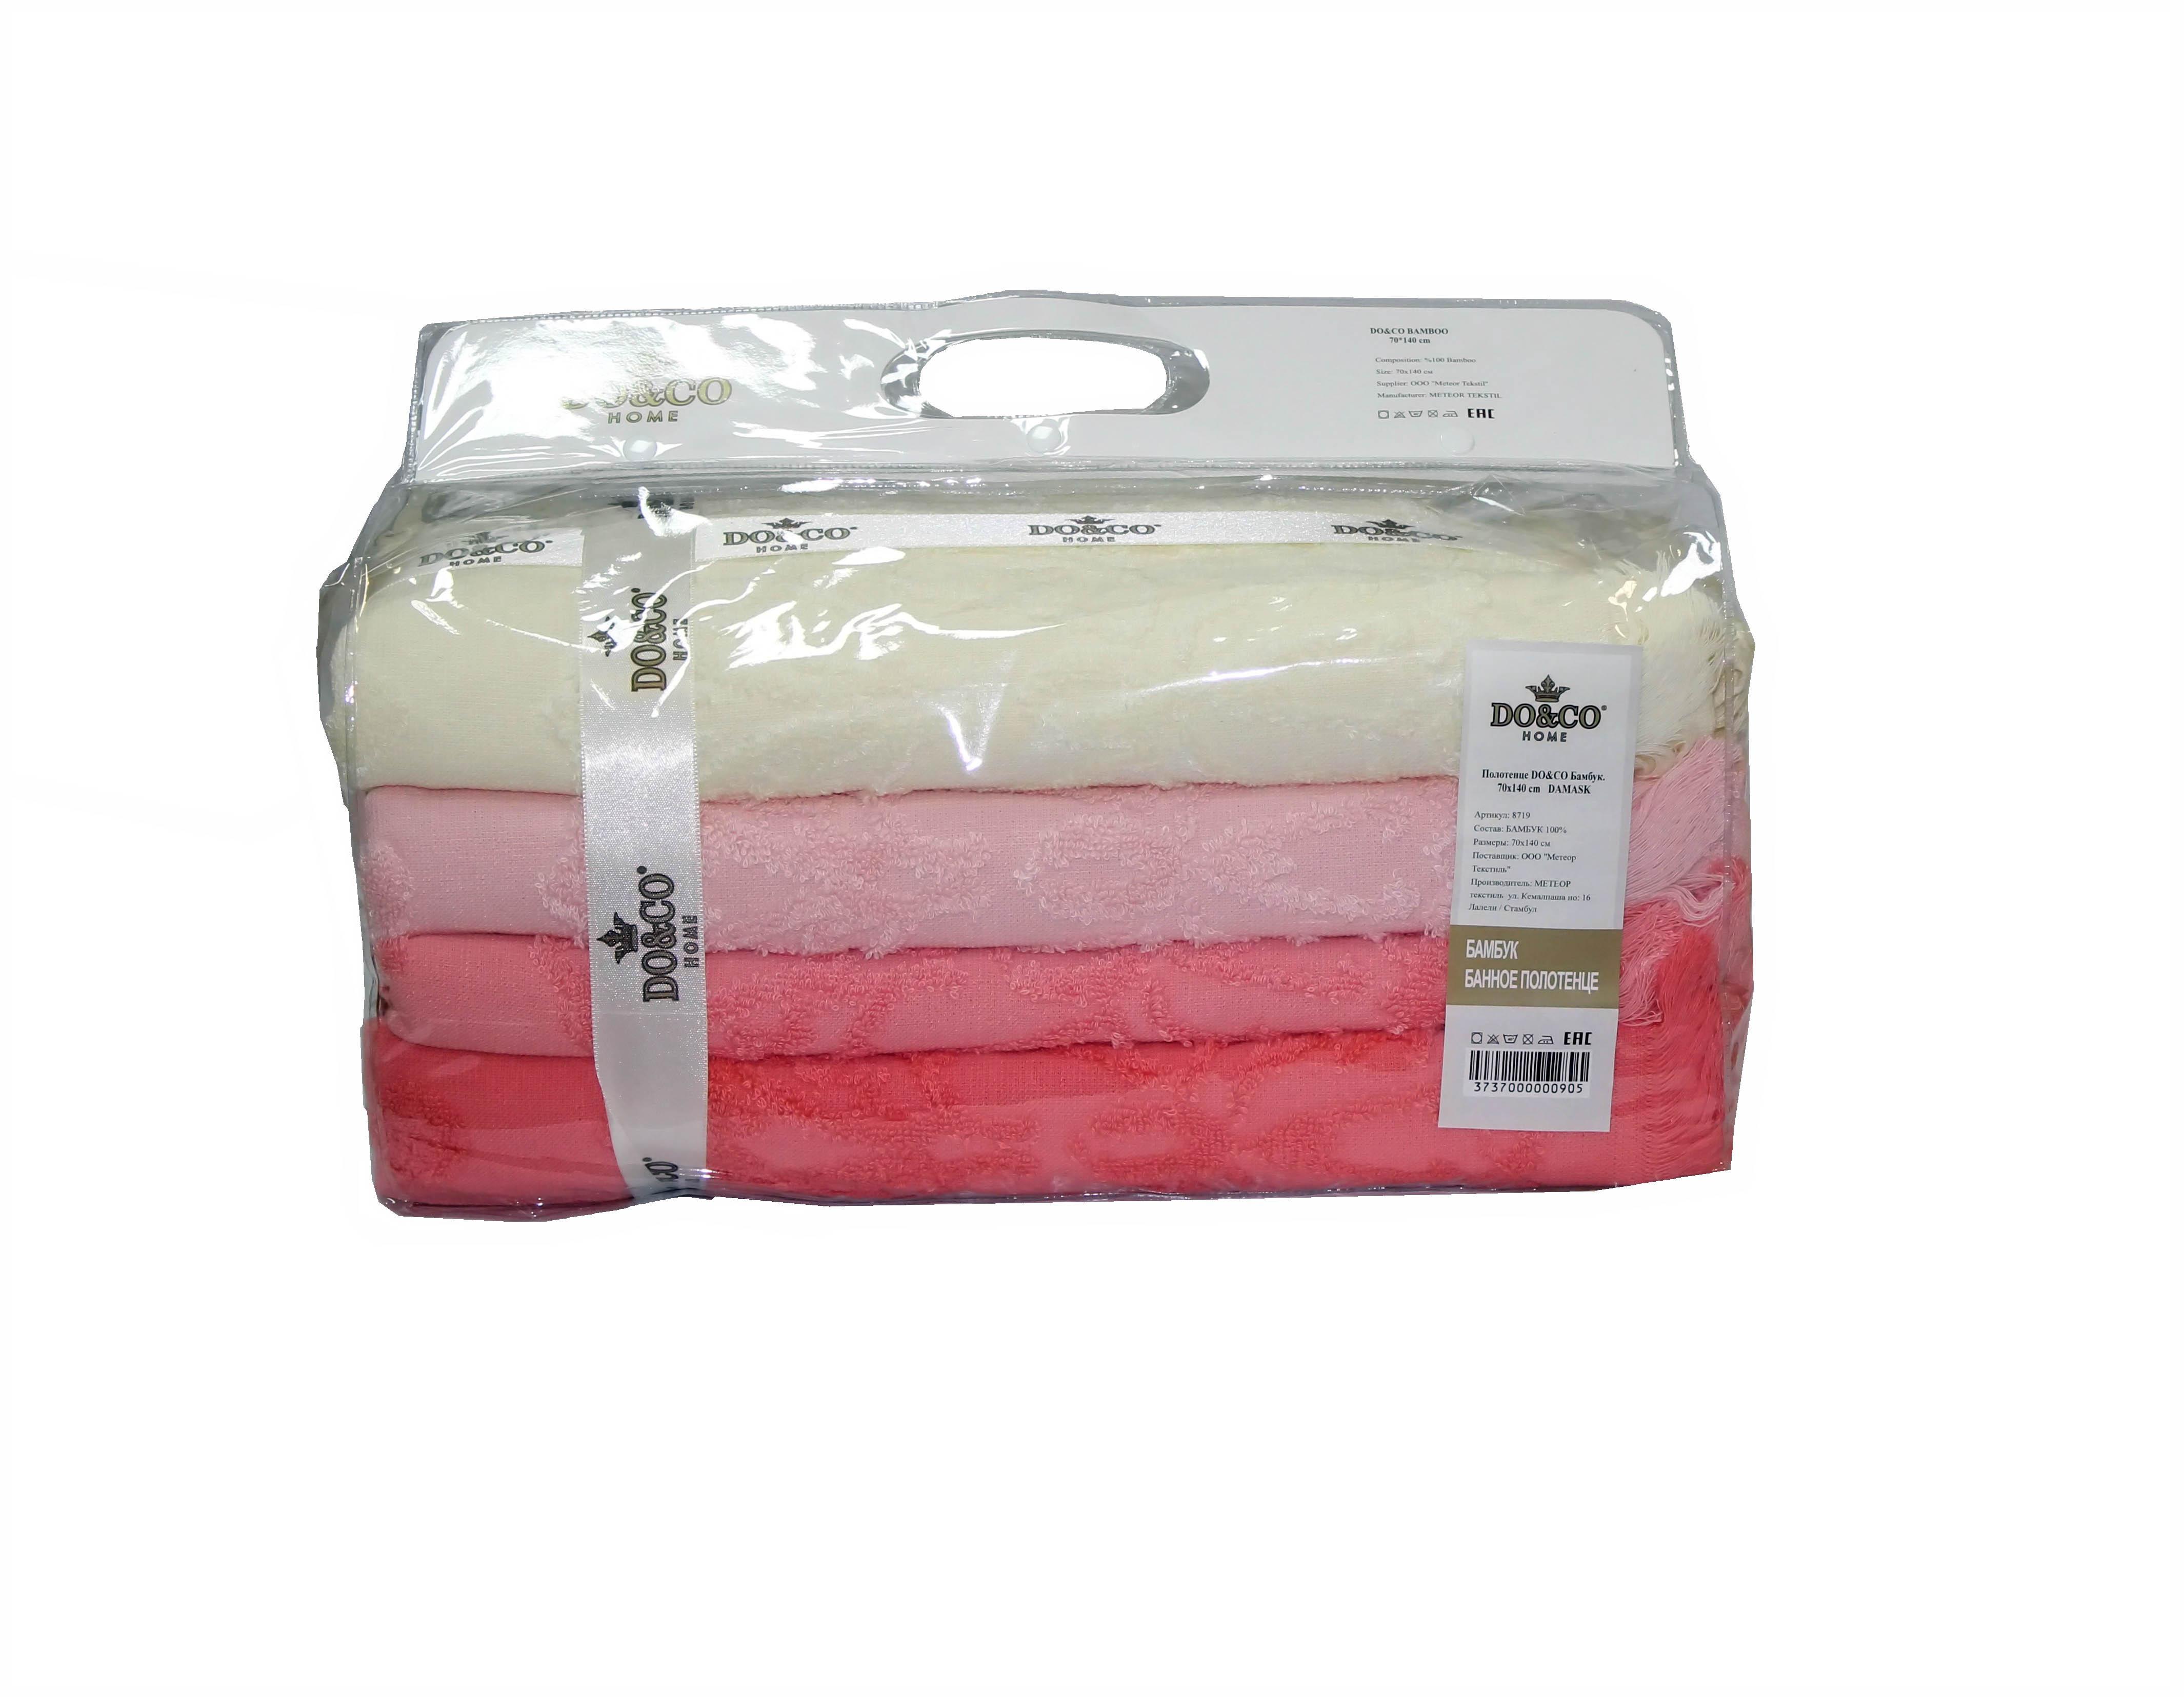 Полотенца DO'n'CO Набор Полотенец Damask (70х140 см - 4 шт) полотенца do n co набор полотенец clara 70х140 см 4 шт